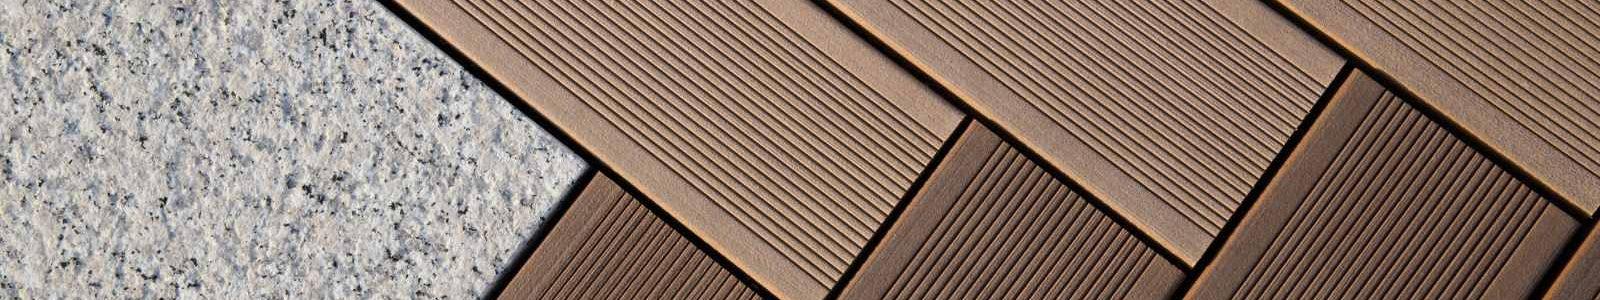 woodplastic-terasy-star-teak-a-palisander-6